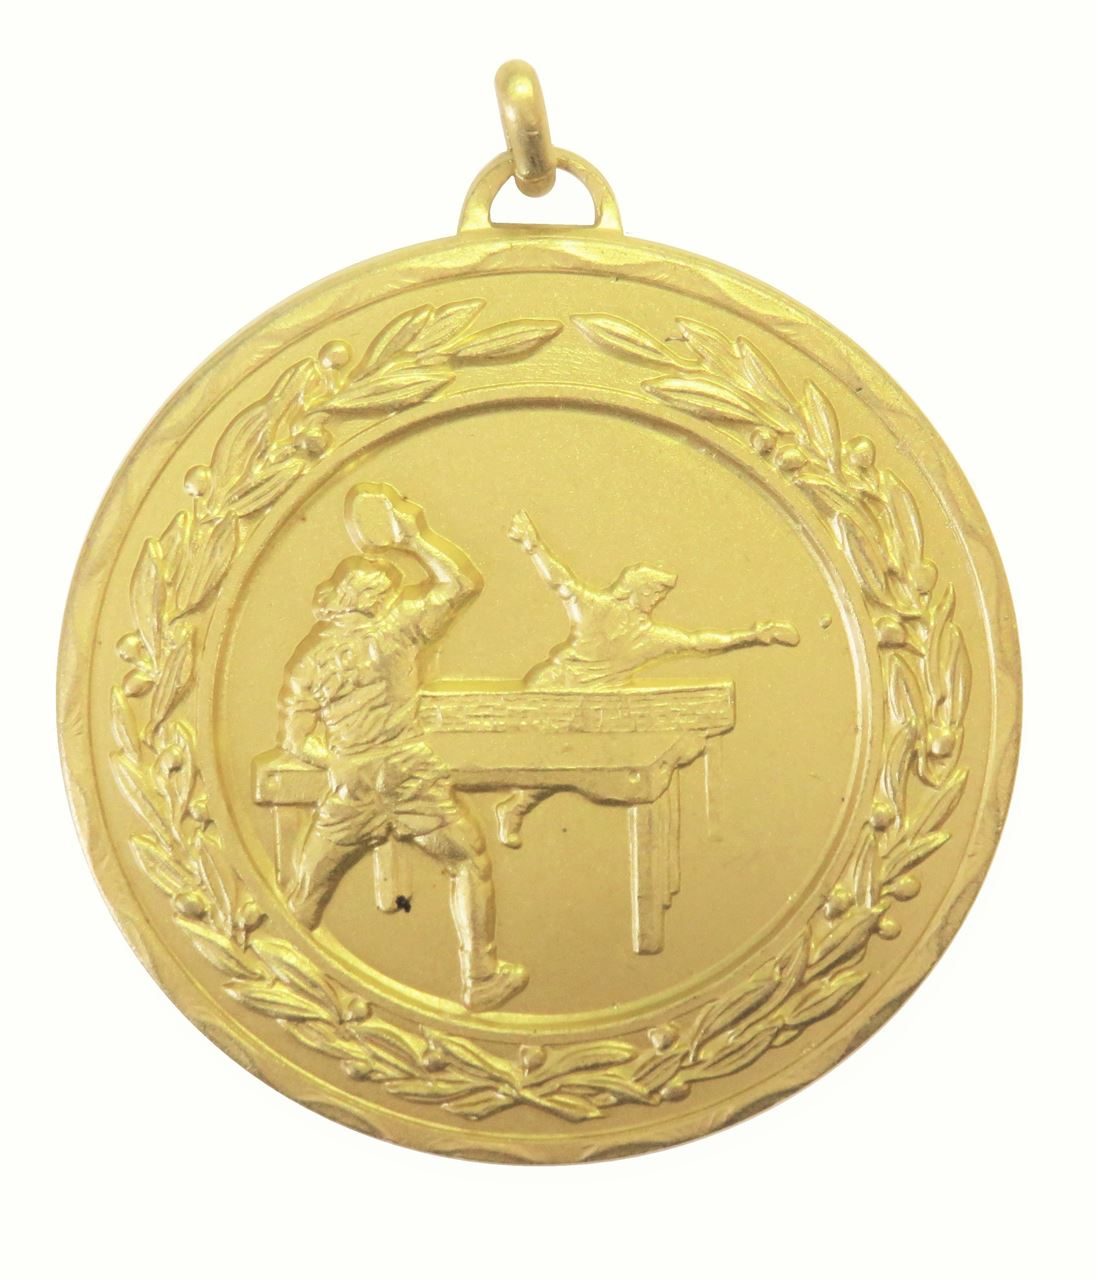 Gold Laurel Economy Table Tennis Medal (size: 50mm) - 4140E